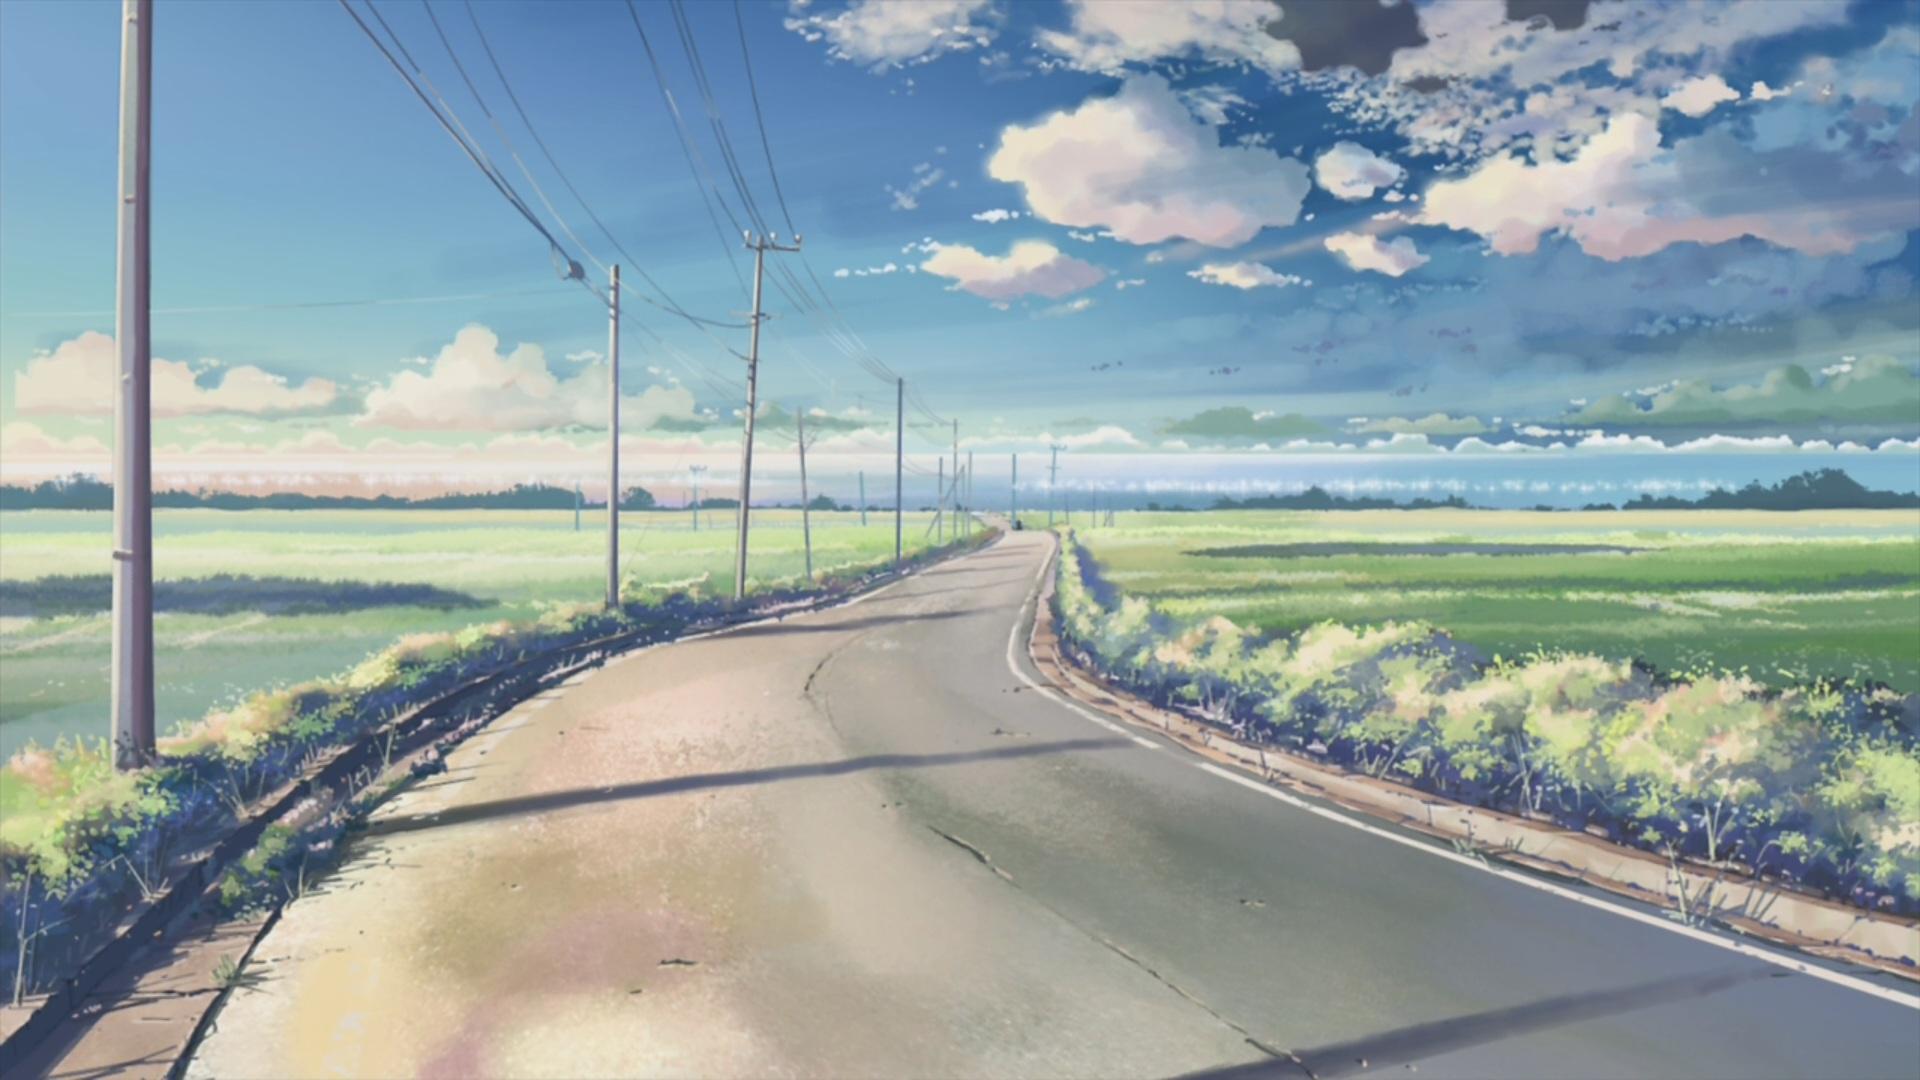 Anime Scenery Wallpapers   WallpaperVortexcom 1920x1080